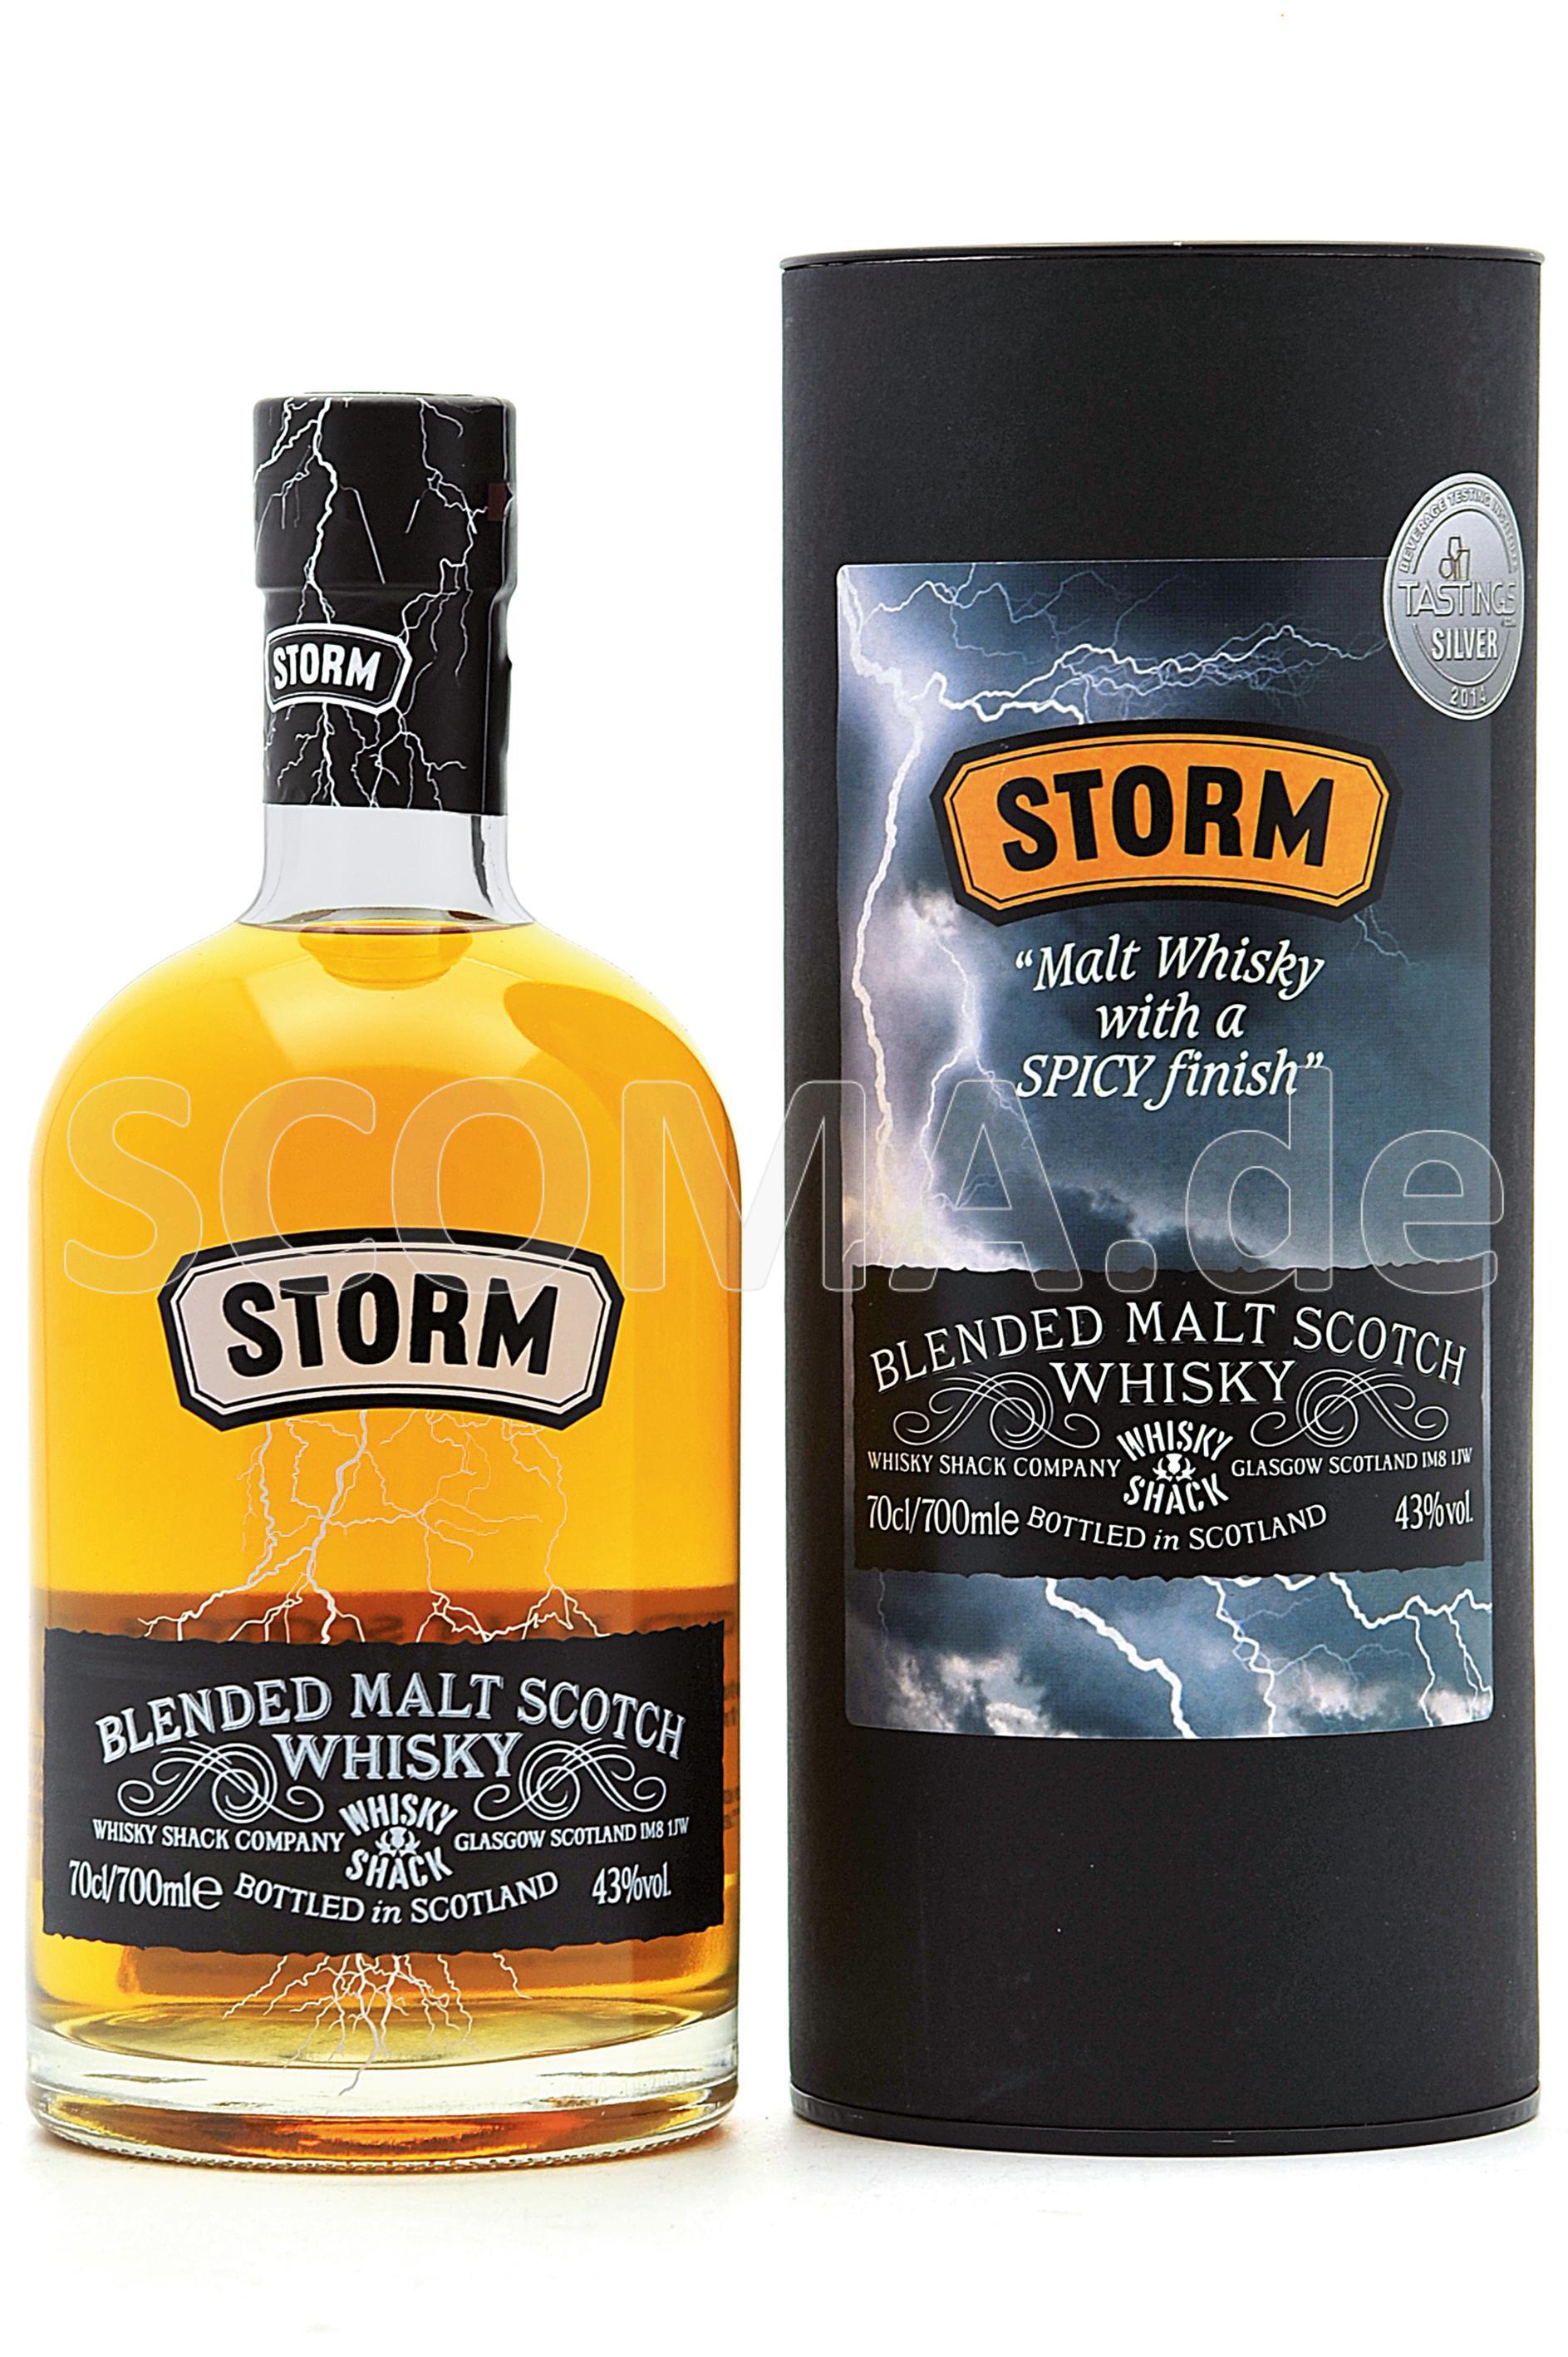 Storm Blended Malt Scotch Whis...